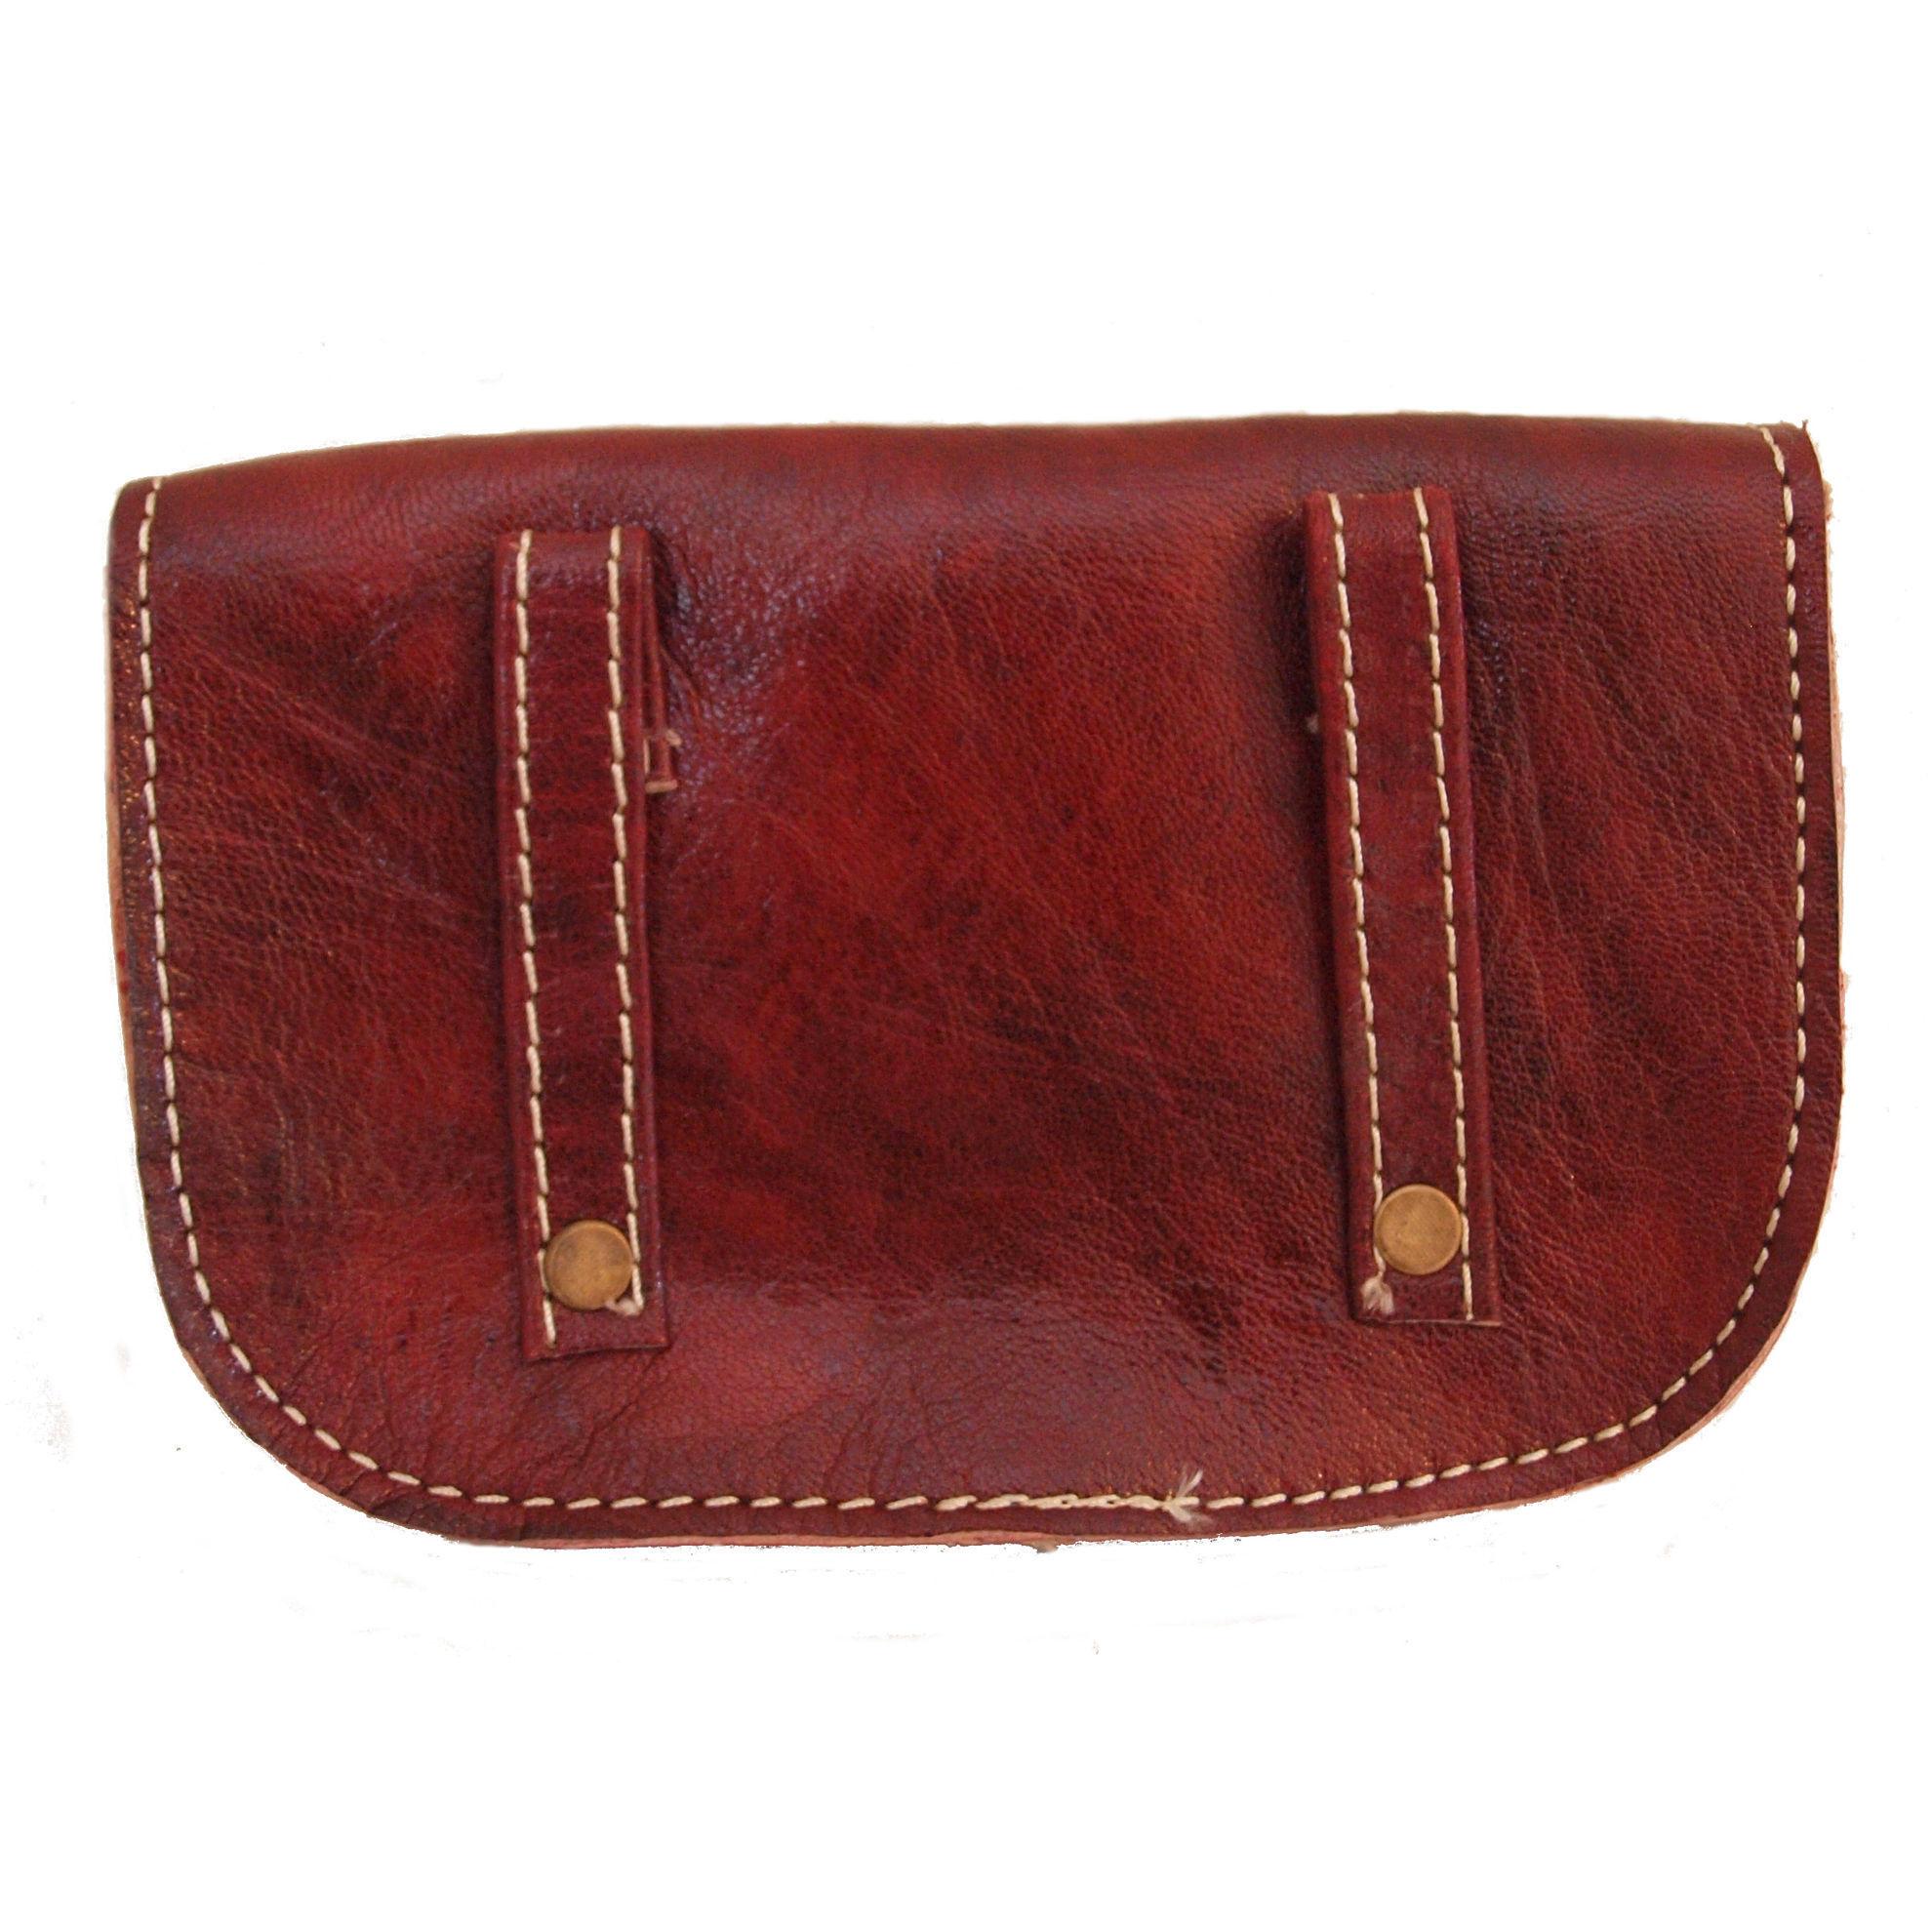 leather-belt-pouch-in-oxblood